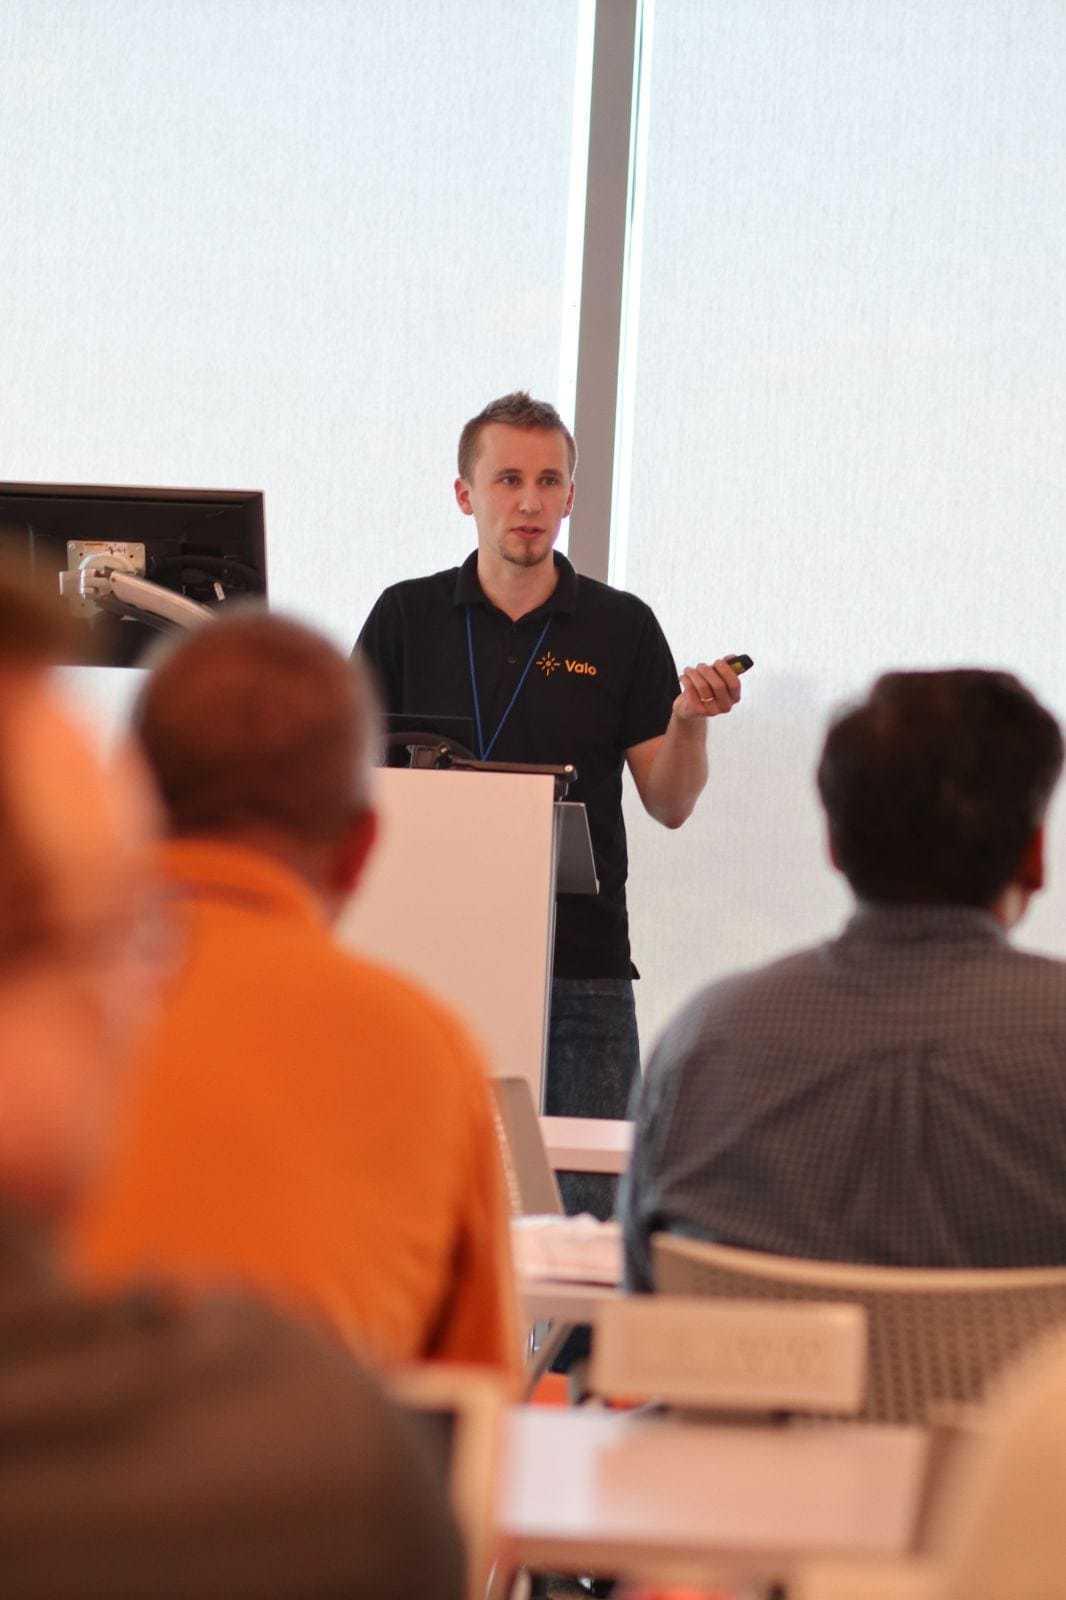 Antti K. Koskela's SPS Houston session